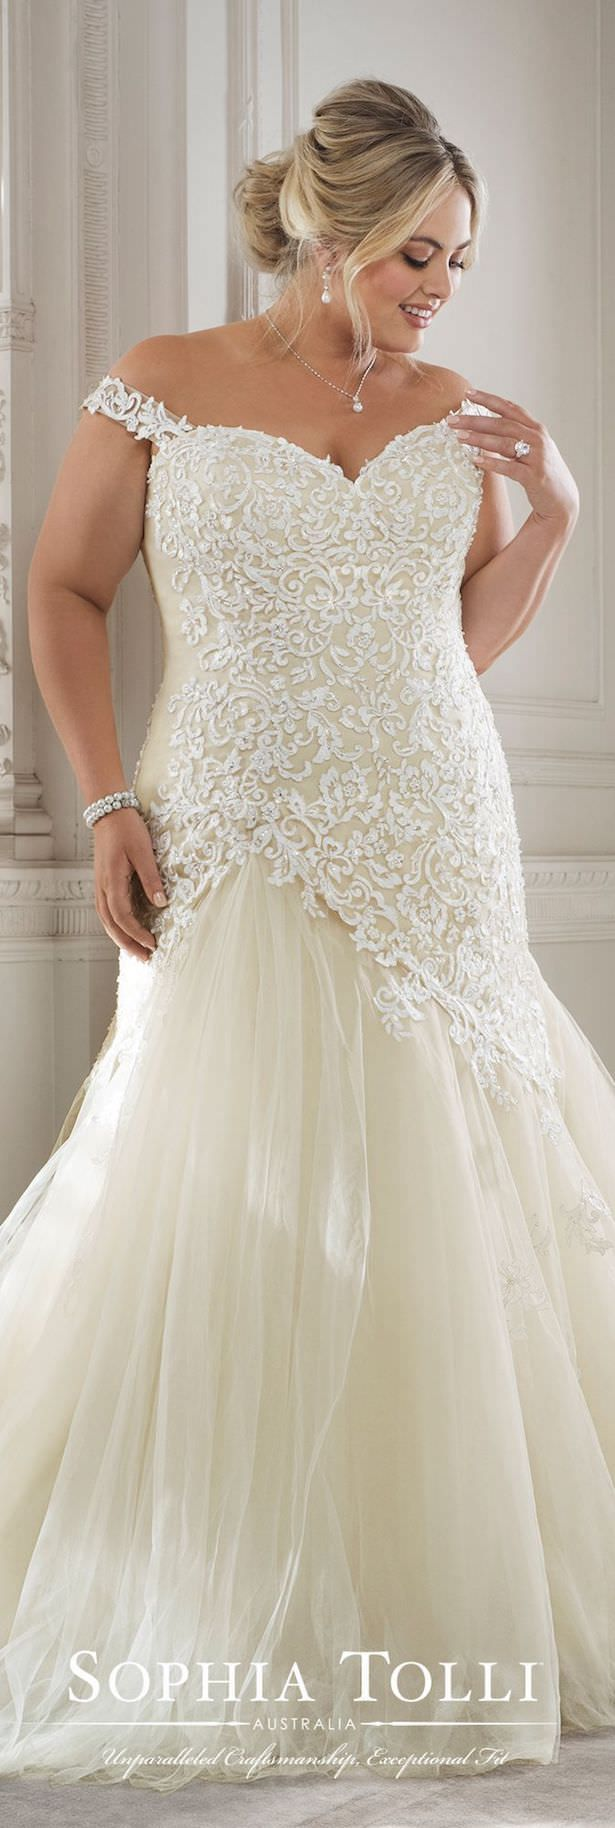 Plus size perfection from sophia tolli wedding dresses pinterest